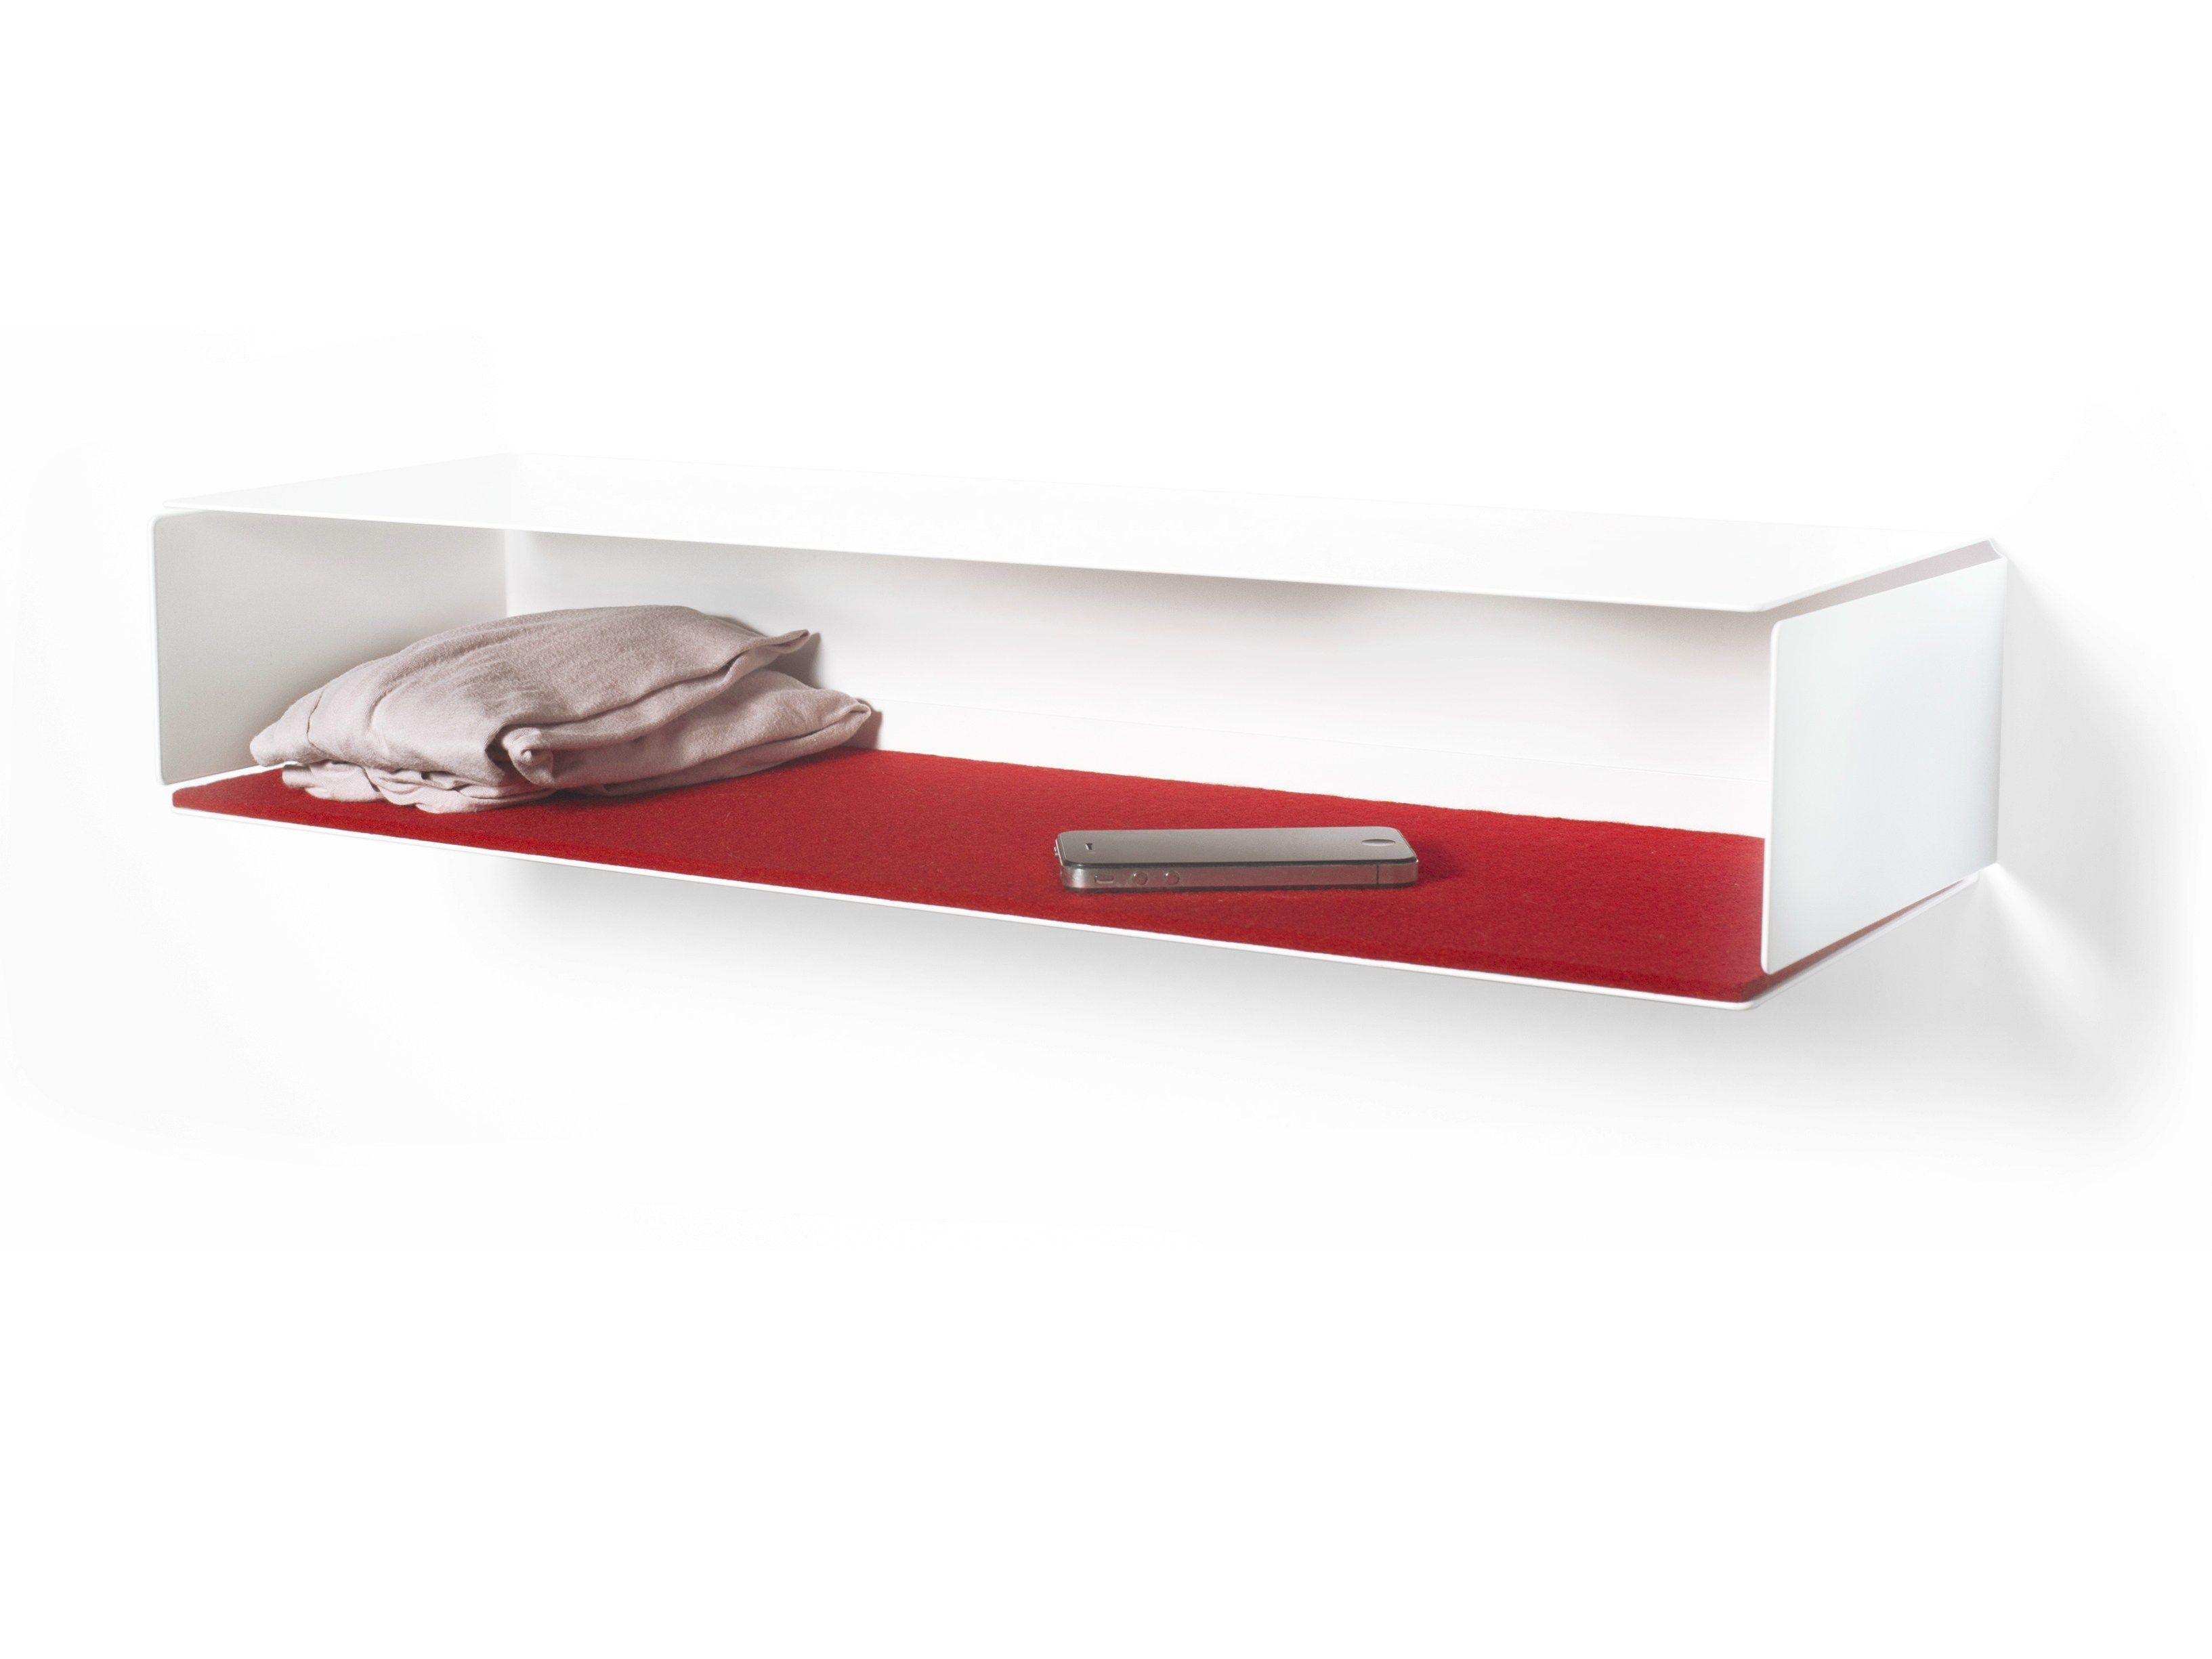 wandregal aus pulverbeschichtetem stahl side box by. Black Bedroom Furniture Sets. Home Design Ideas